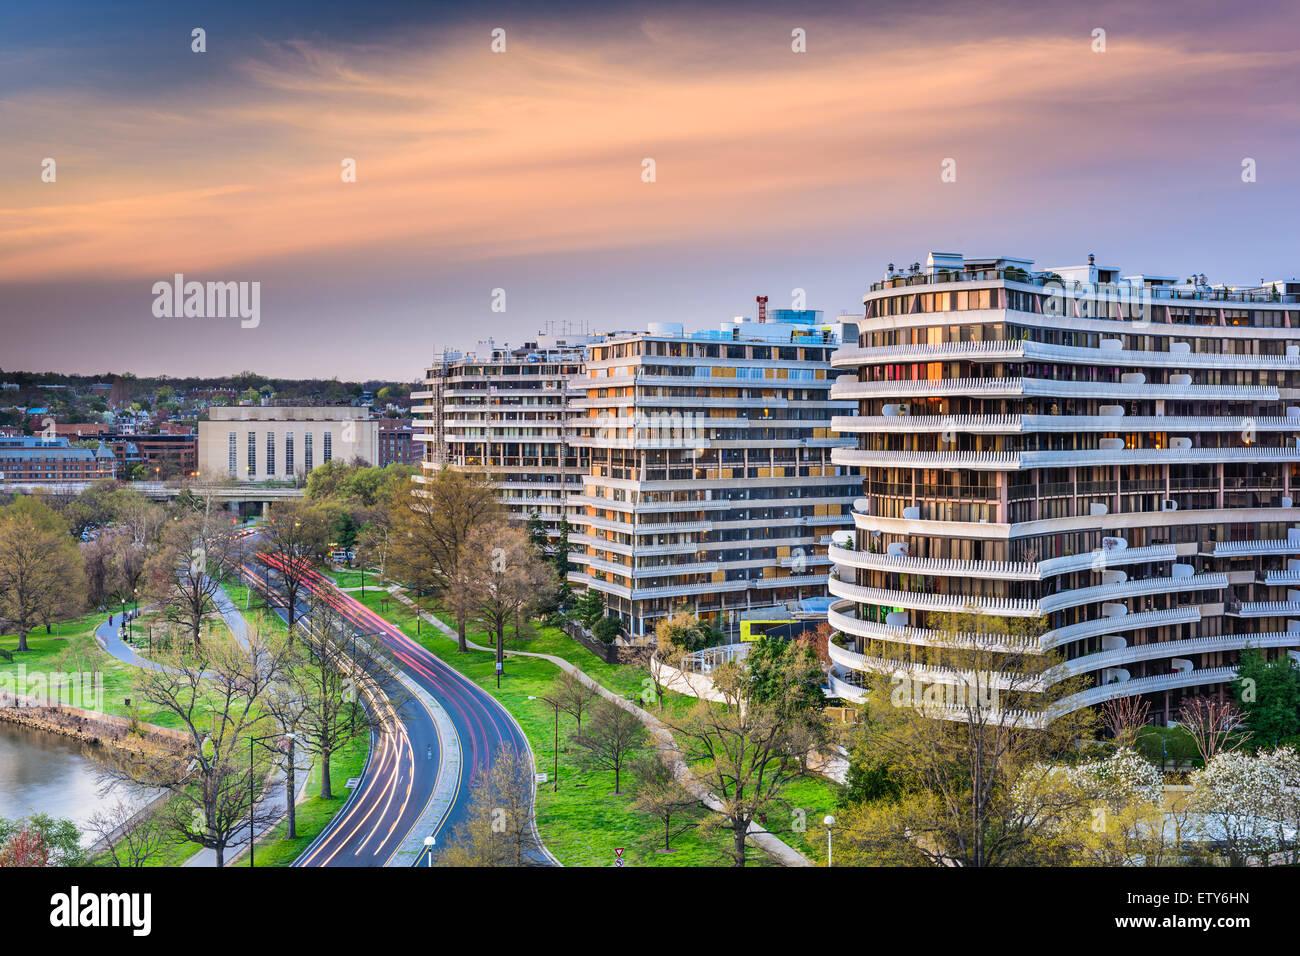 Washington, DC, USA paysage urbain dans le quartier de Foggy Bottom. Photo Stock